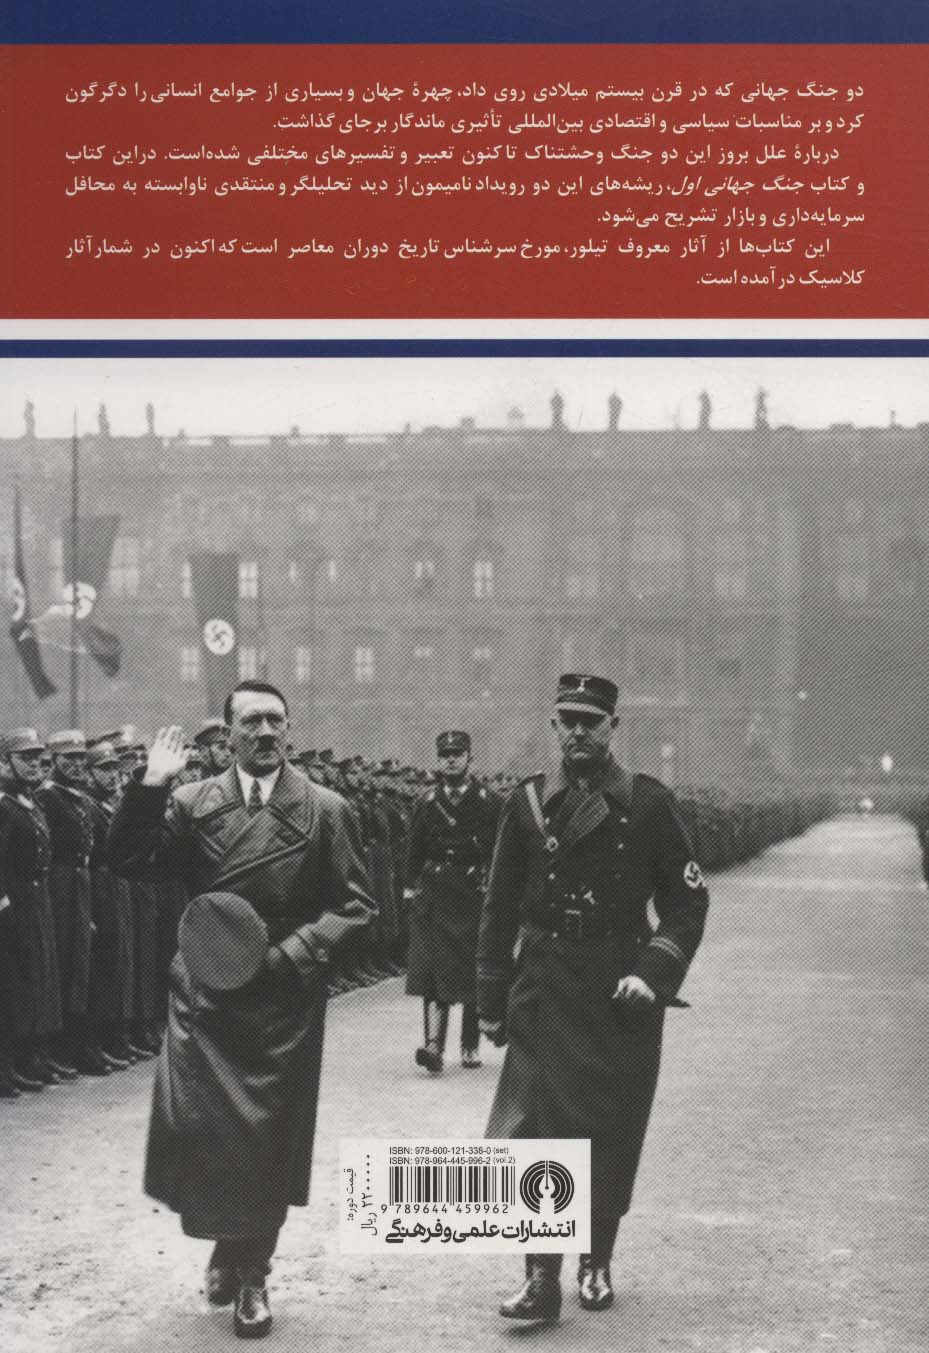 جنگ جهانی اول و دوم (2جلدی)